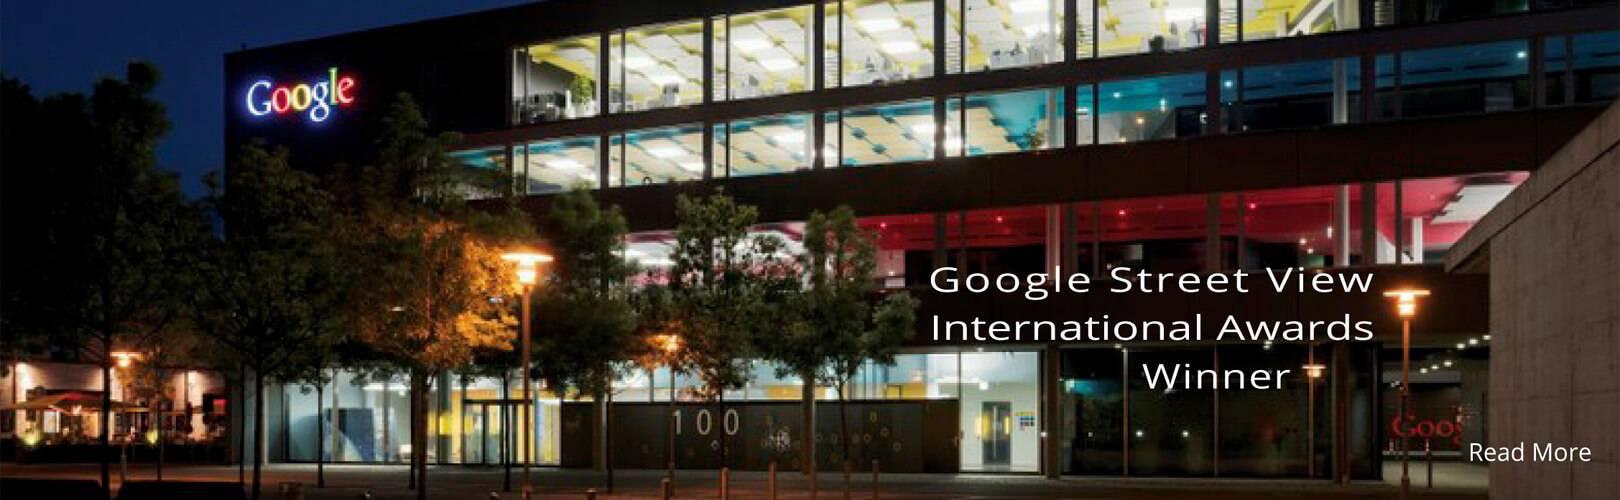 Google-Street-View-International-Award-Winner-V5-1620x500